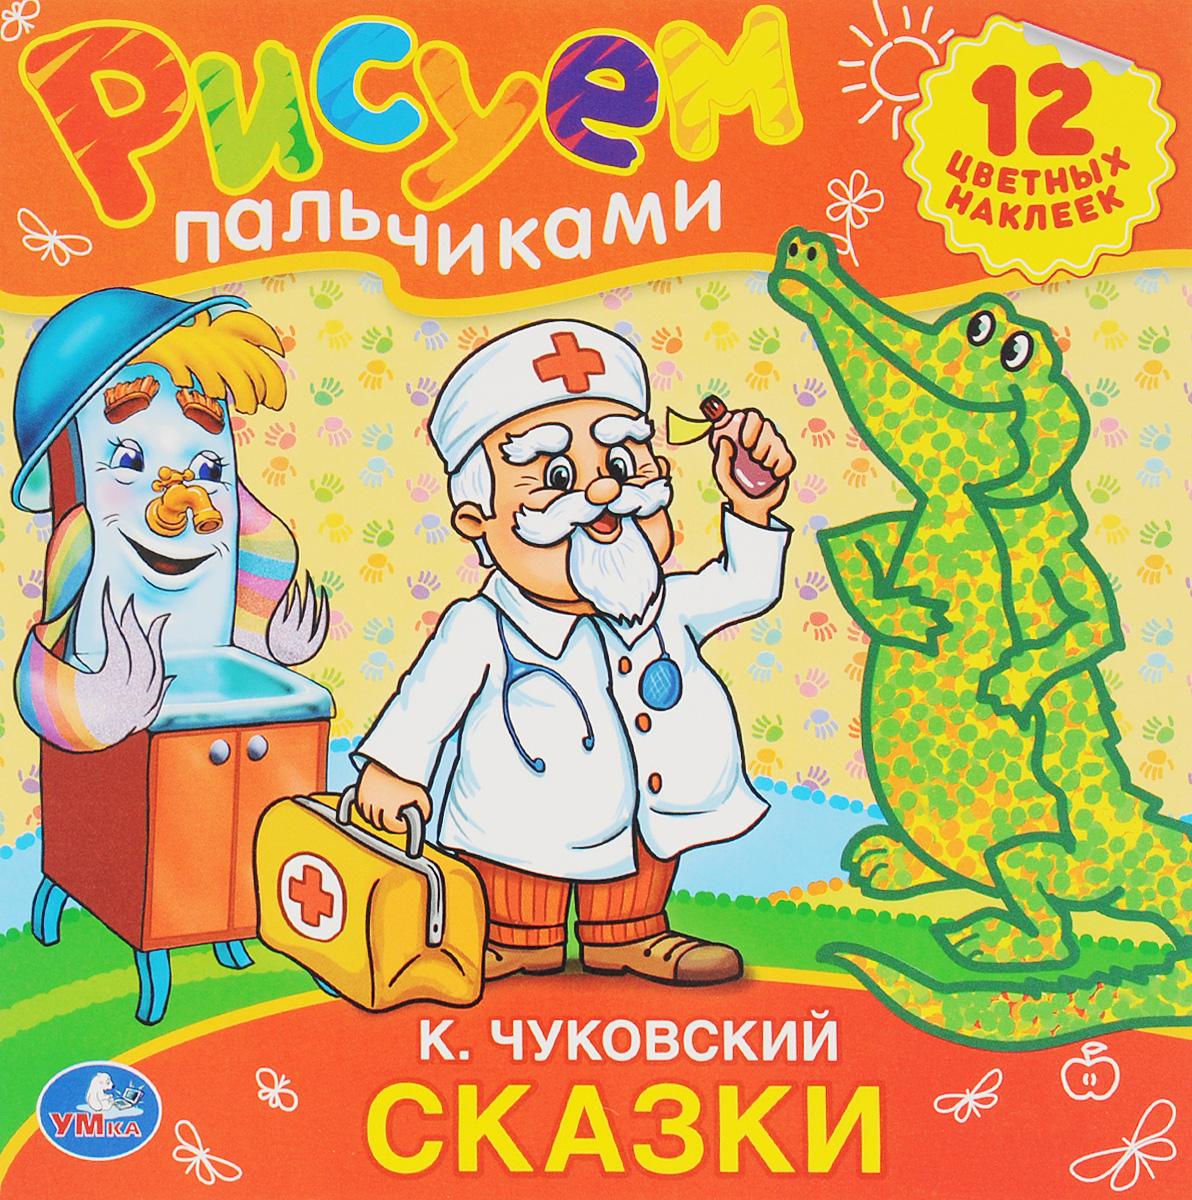 Сказки К. Чуковский. Раскраска (+ наклейки)